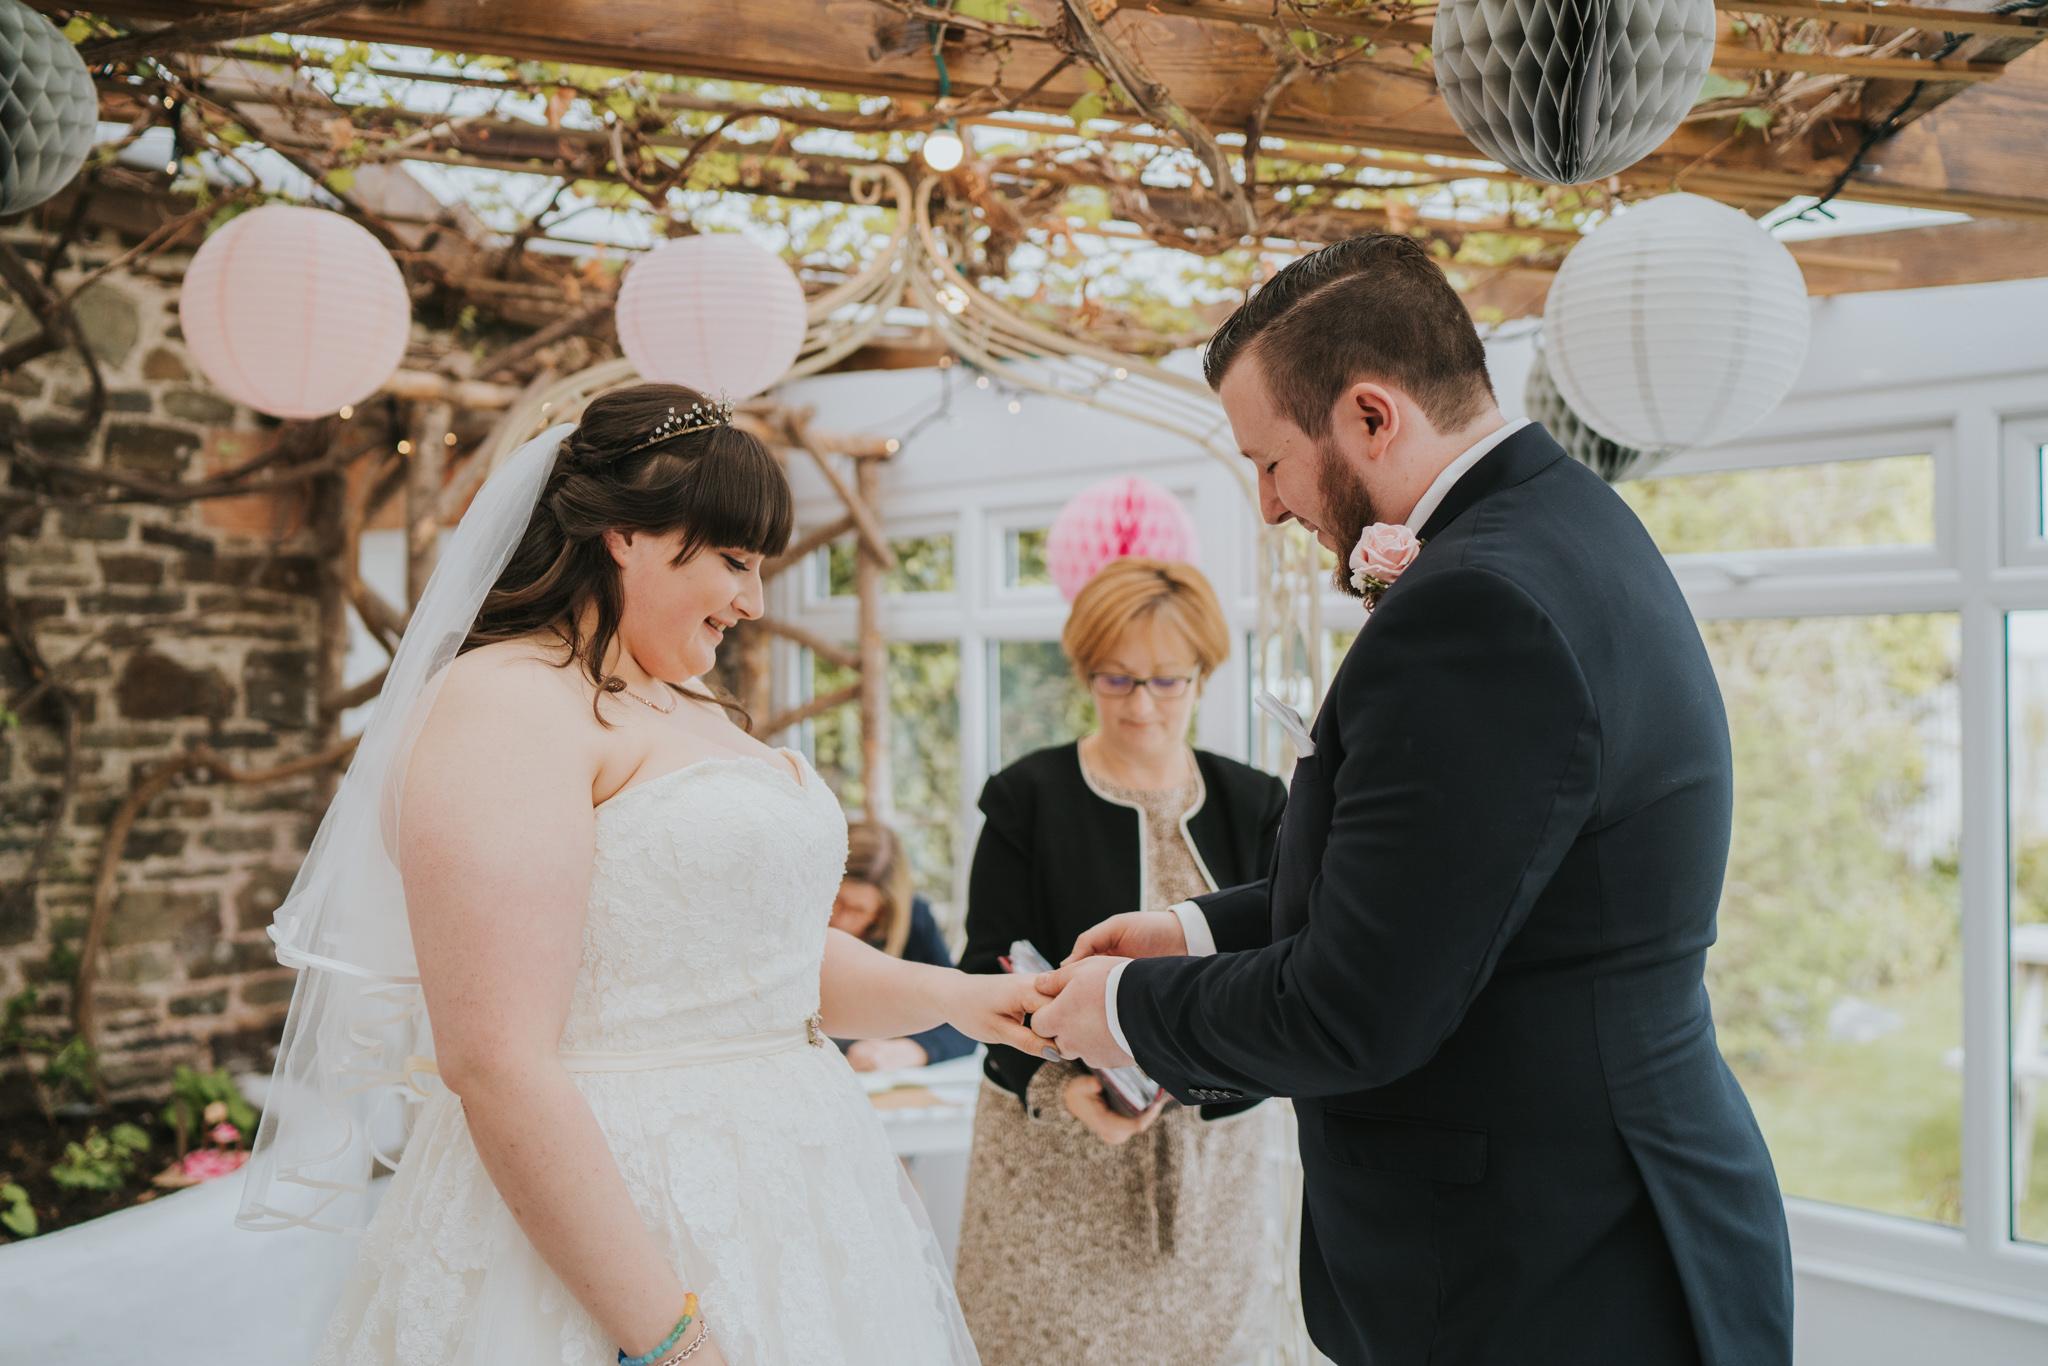 grace-sam-old-barn-clovelly-devon-wedding-photographer-grace-elizabeth-essex-suffolk-norfolk-wedding-photographer (57 of 132).jpg